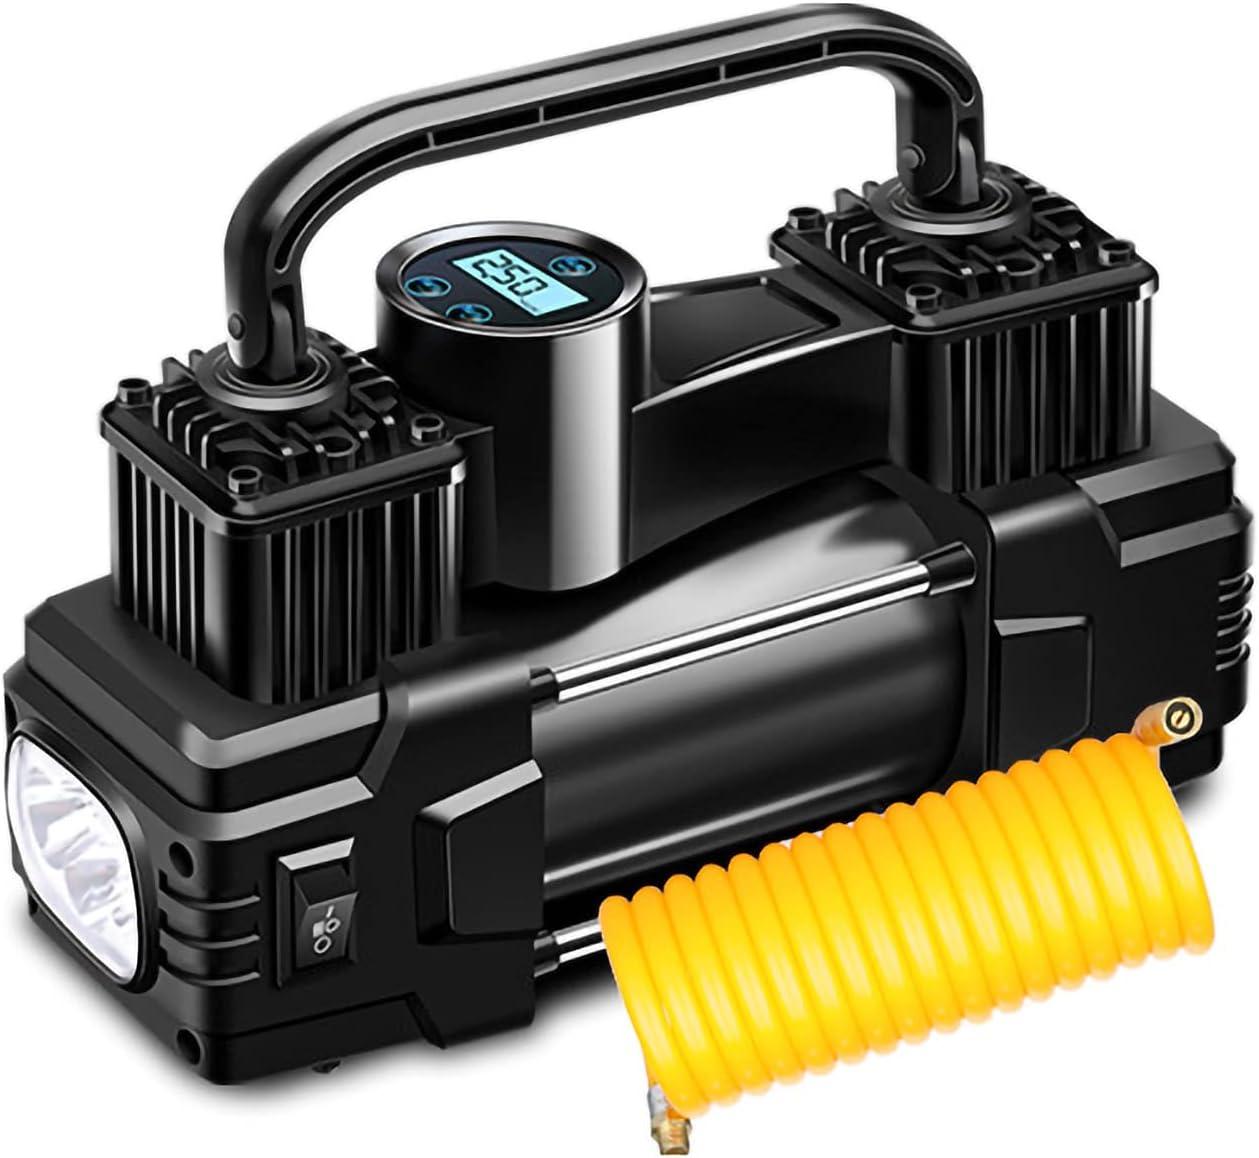 Inflador de neumáticos digital, bomba inflable con cable de 12 V / 24 V, doble cilindro, control de presión de neumáticos de inflado rápido con bomba de aire ligera para coche